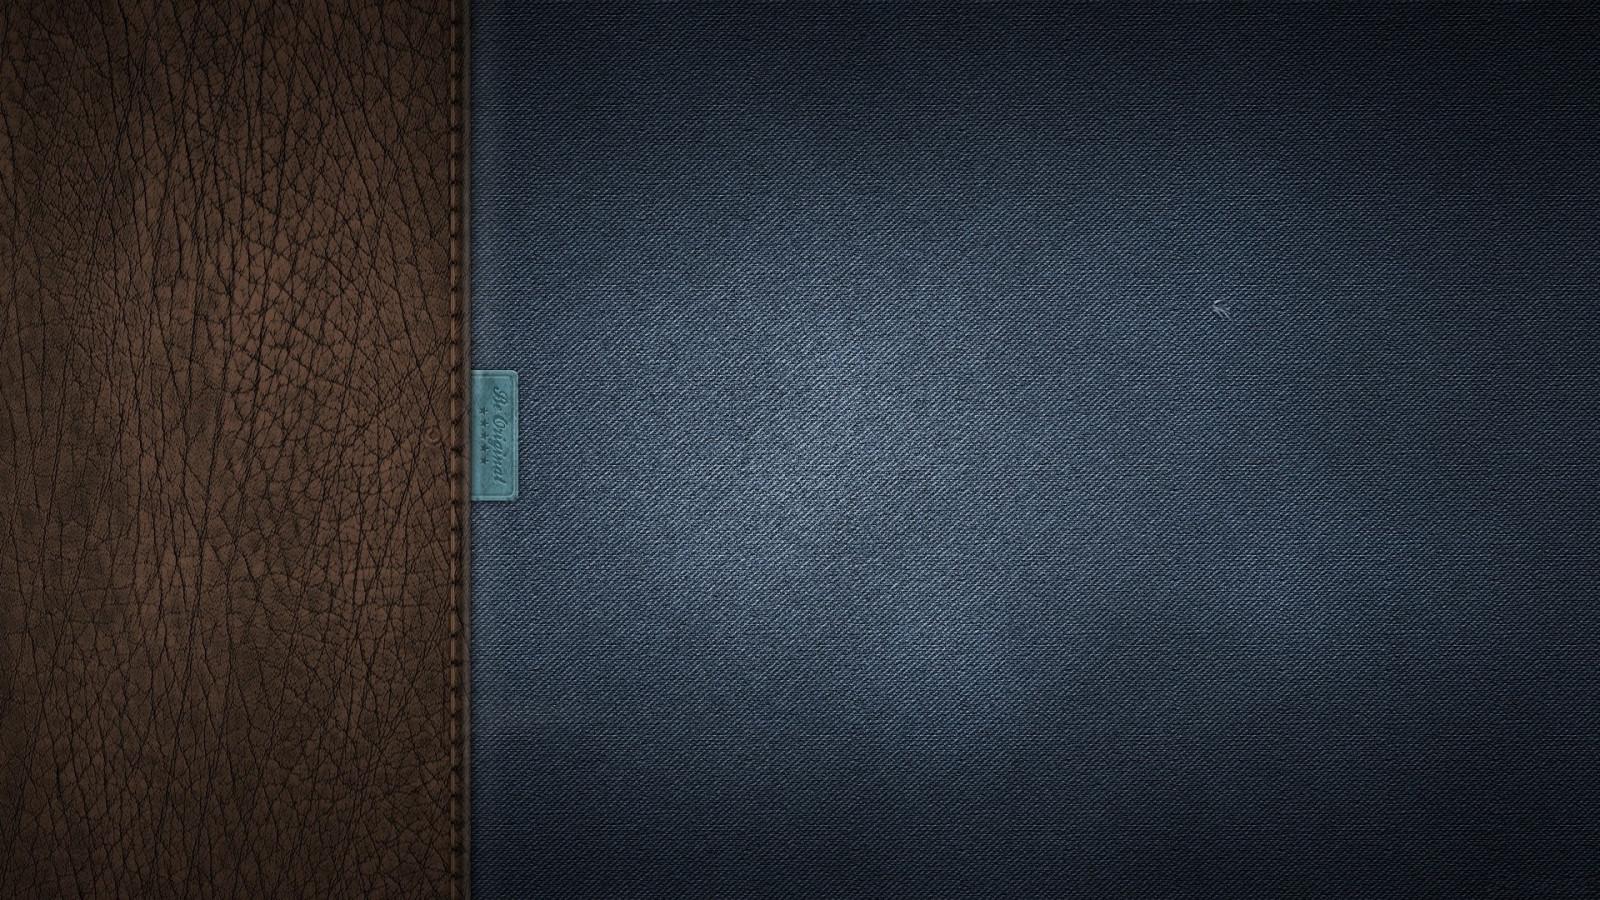 fond d 39 cran noir mur bois vert bleu denim texture cuir design d 39 int rieur couleur. Black Bedroom Furniture Sets. Home Design Ideas